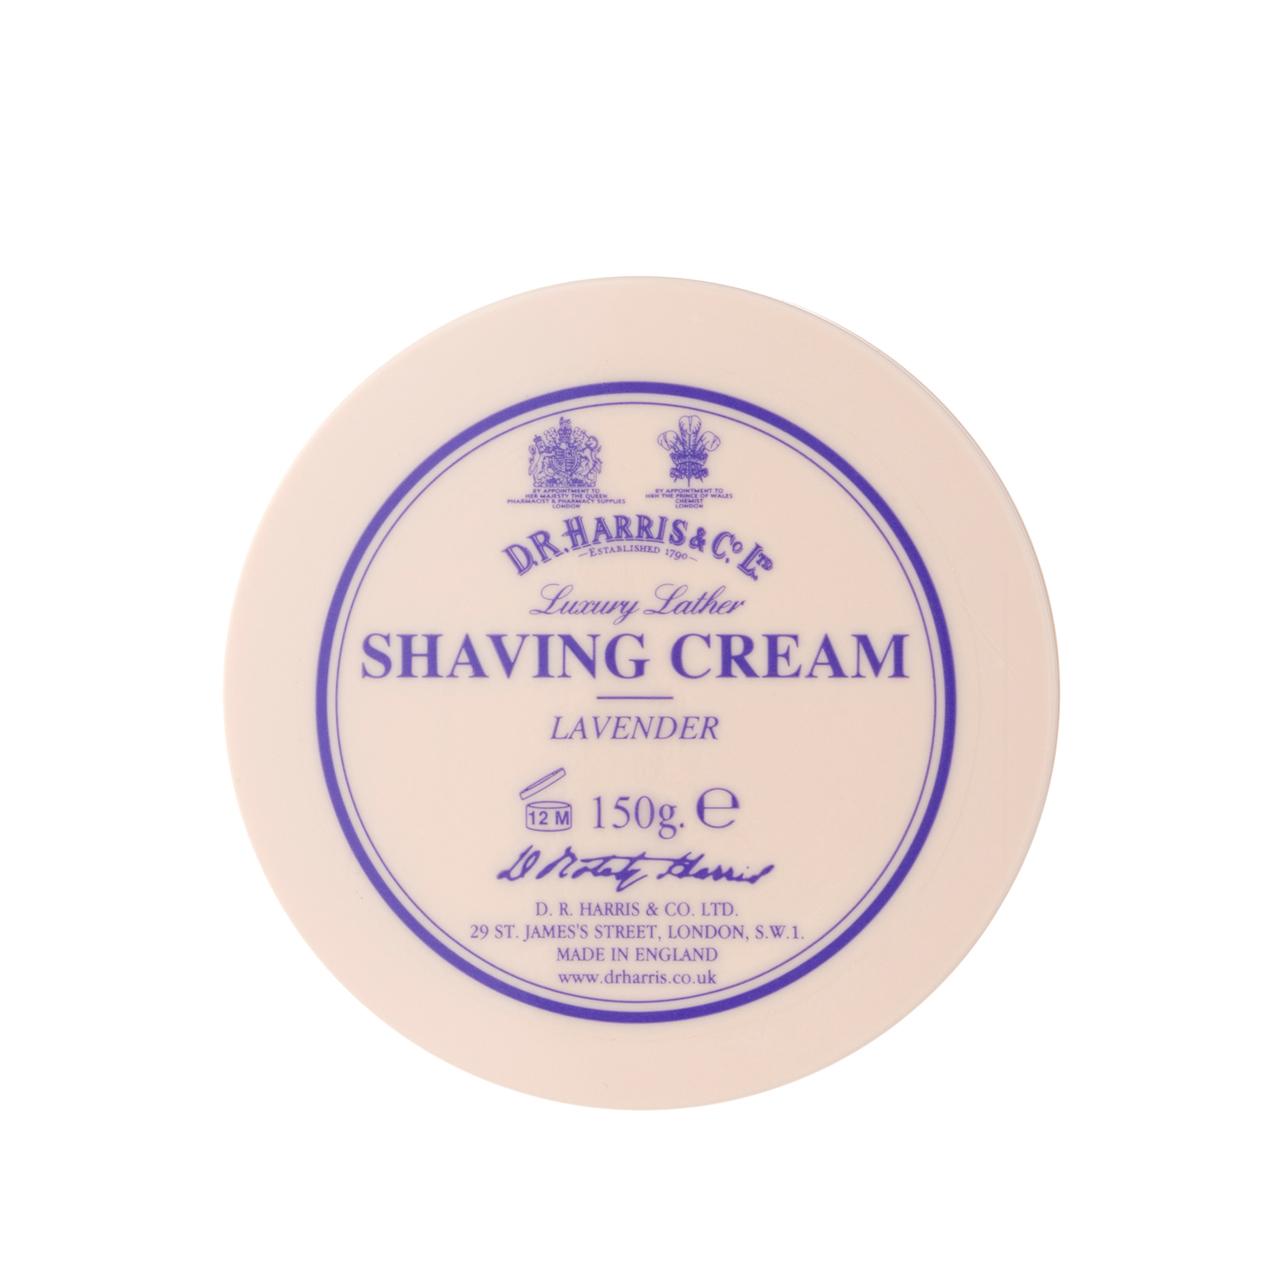 Lavender - Shaving Cream Bowl